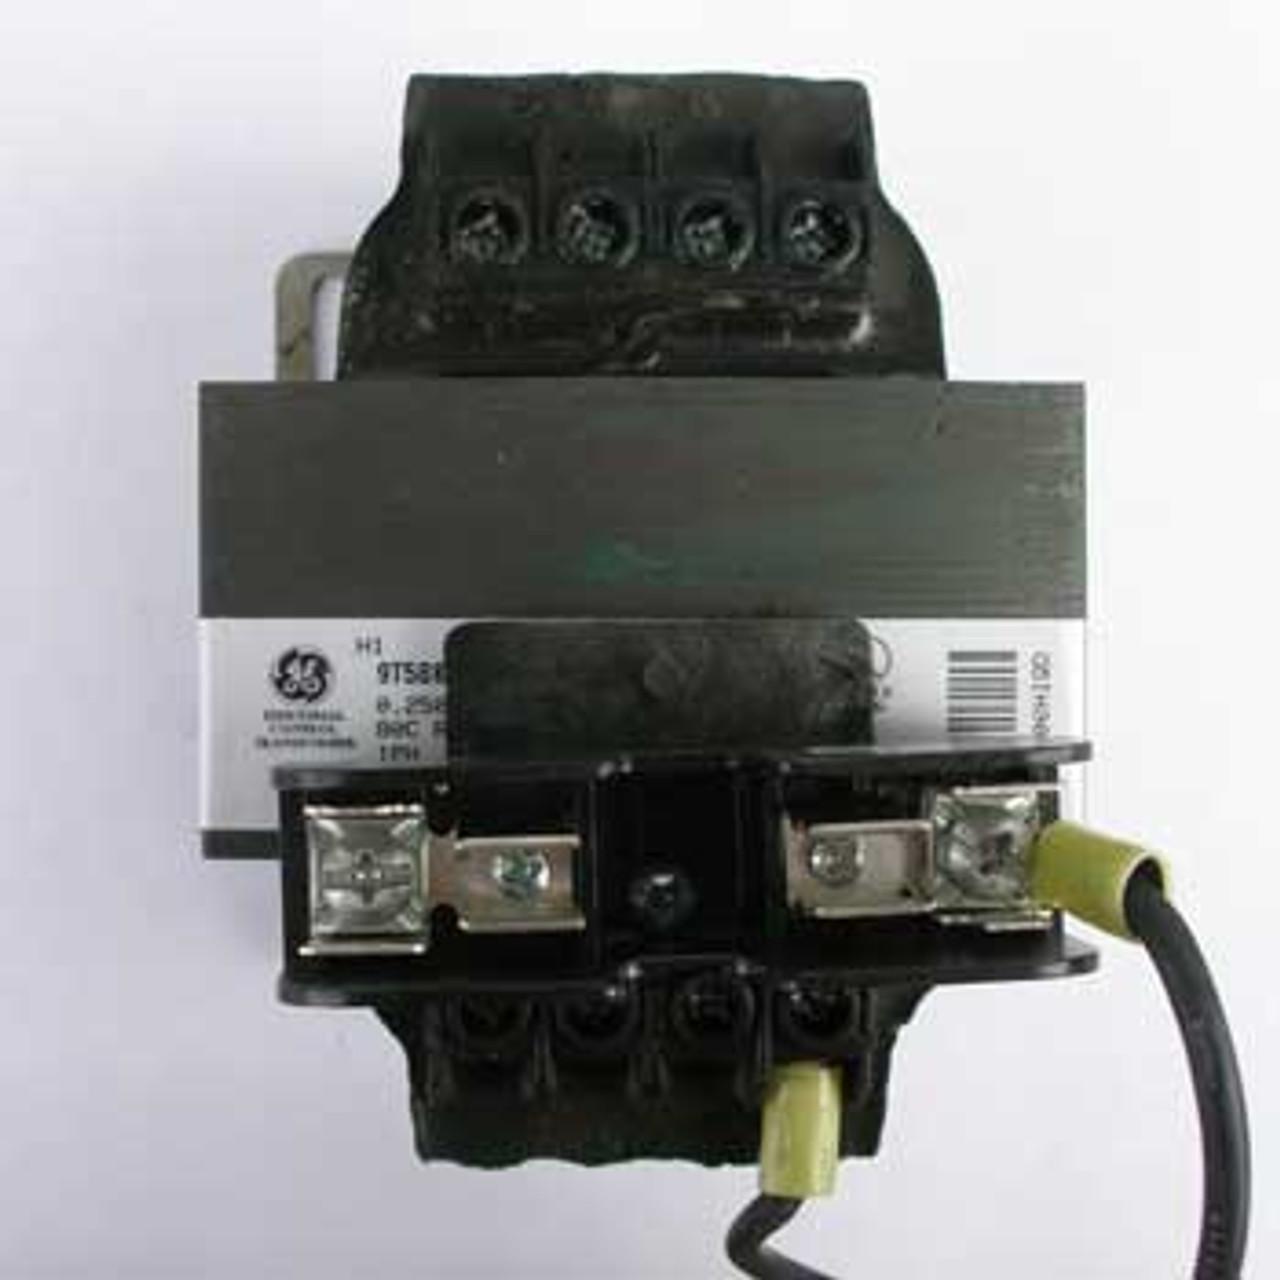 GE 9T58K0047G42 - 0.25 KVA 230x460 TO 115 Volts 1 PH Transformer - New